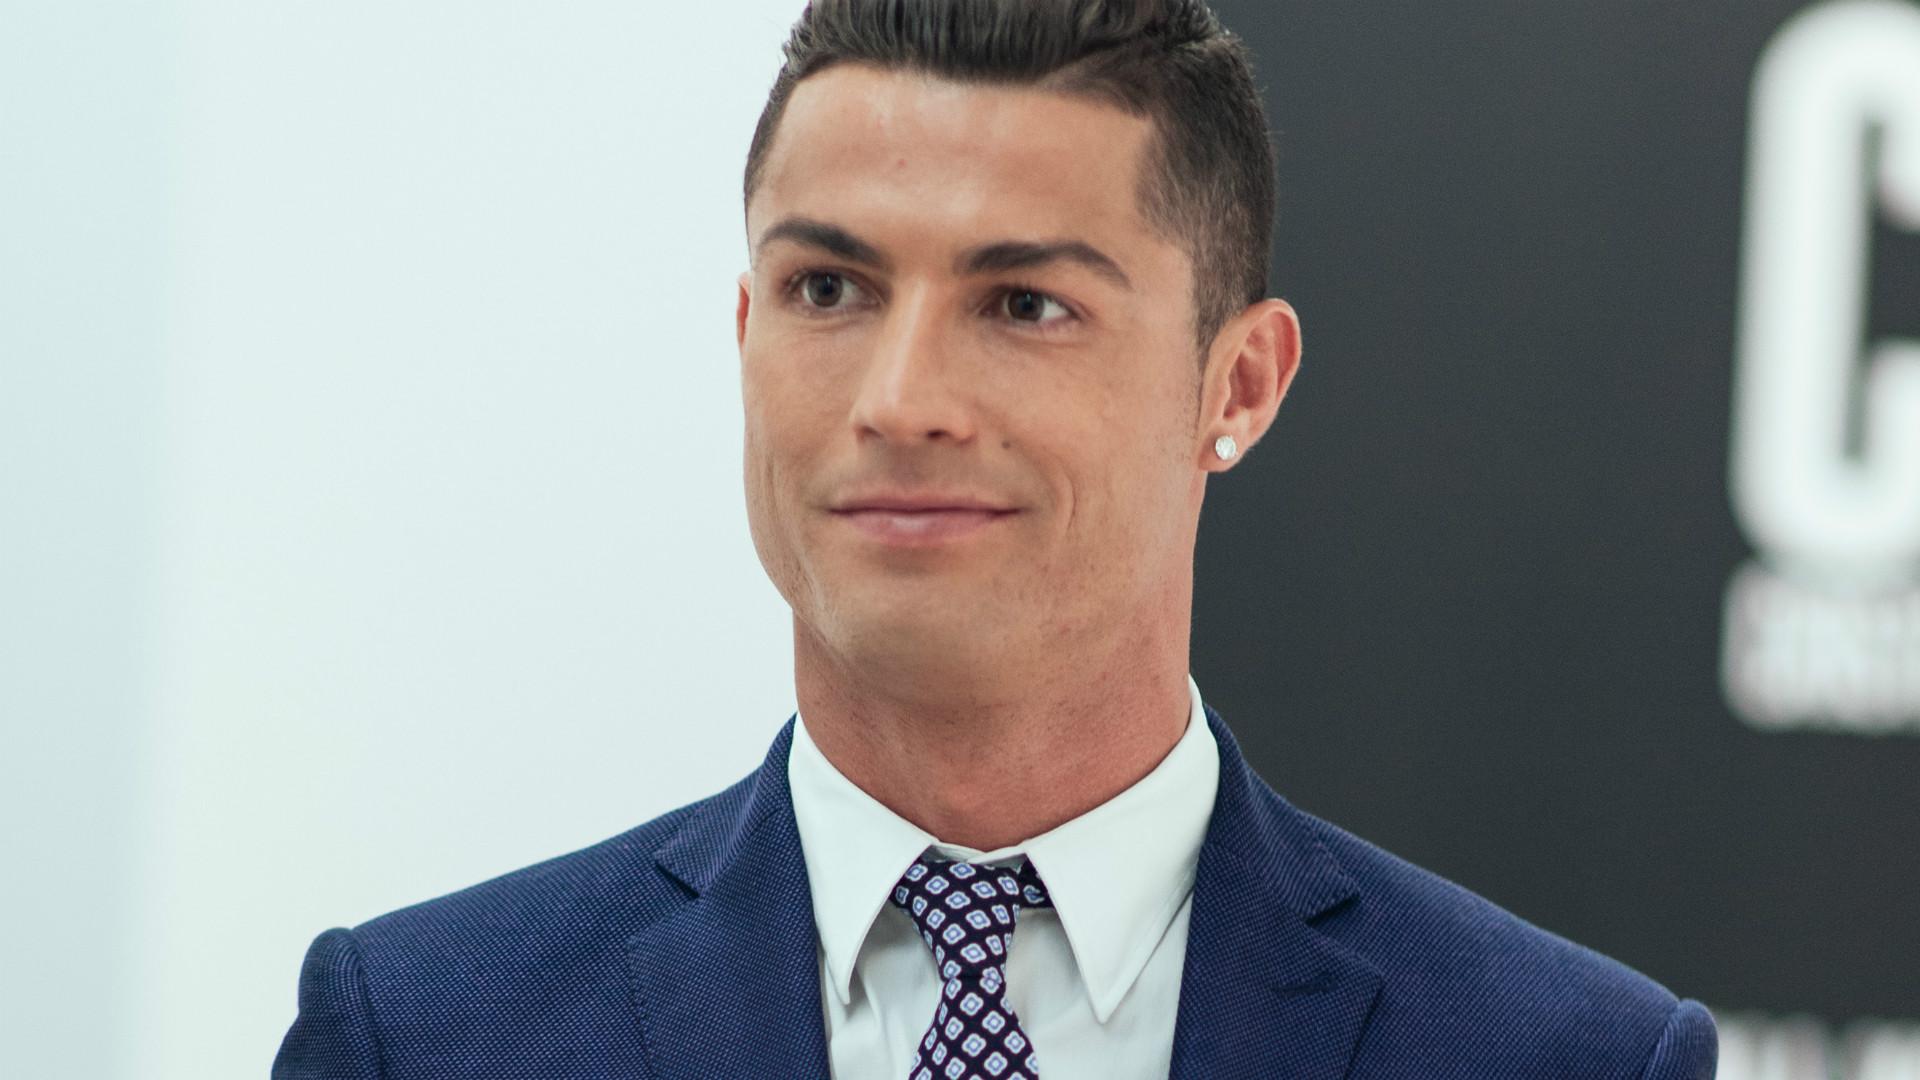 Cristiano Ronaldo Real Madrid 2015-16